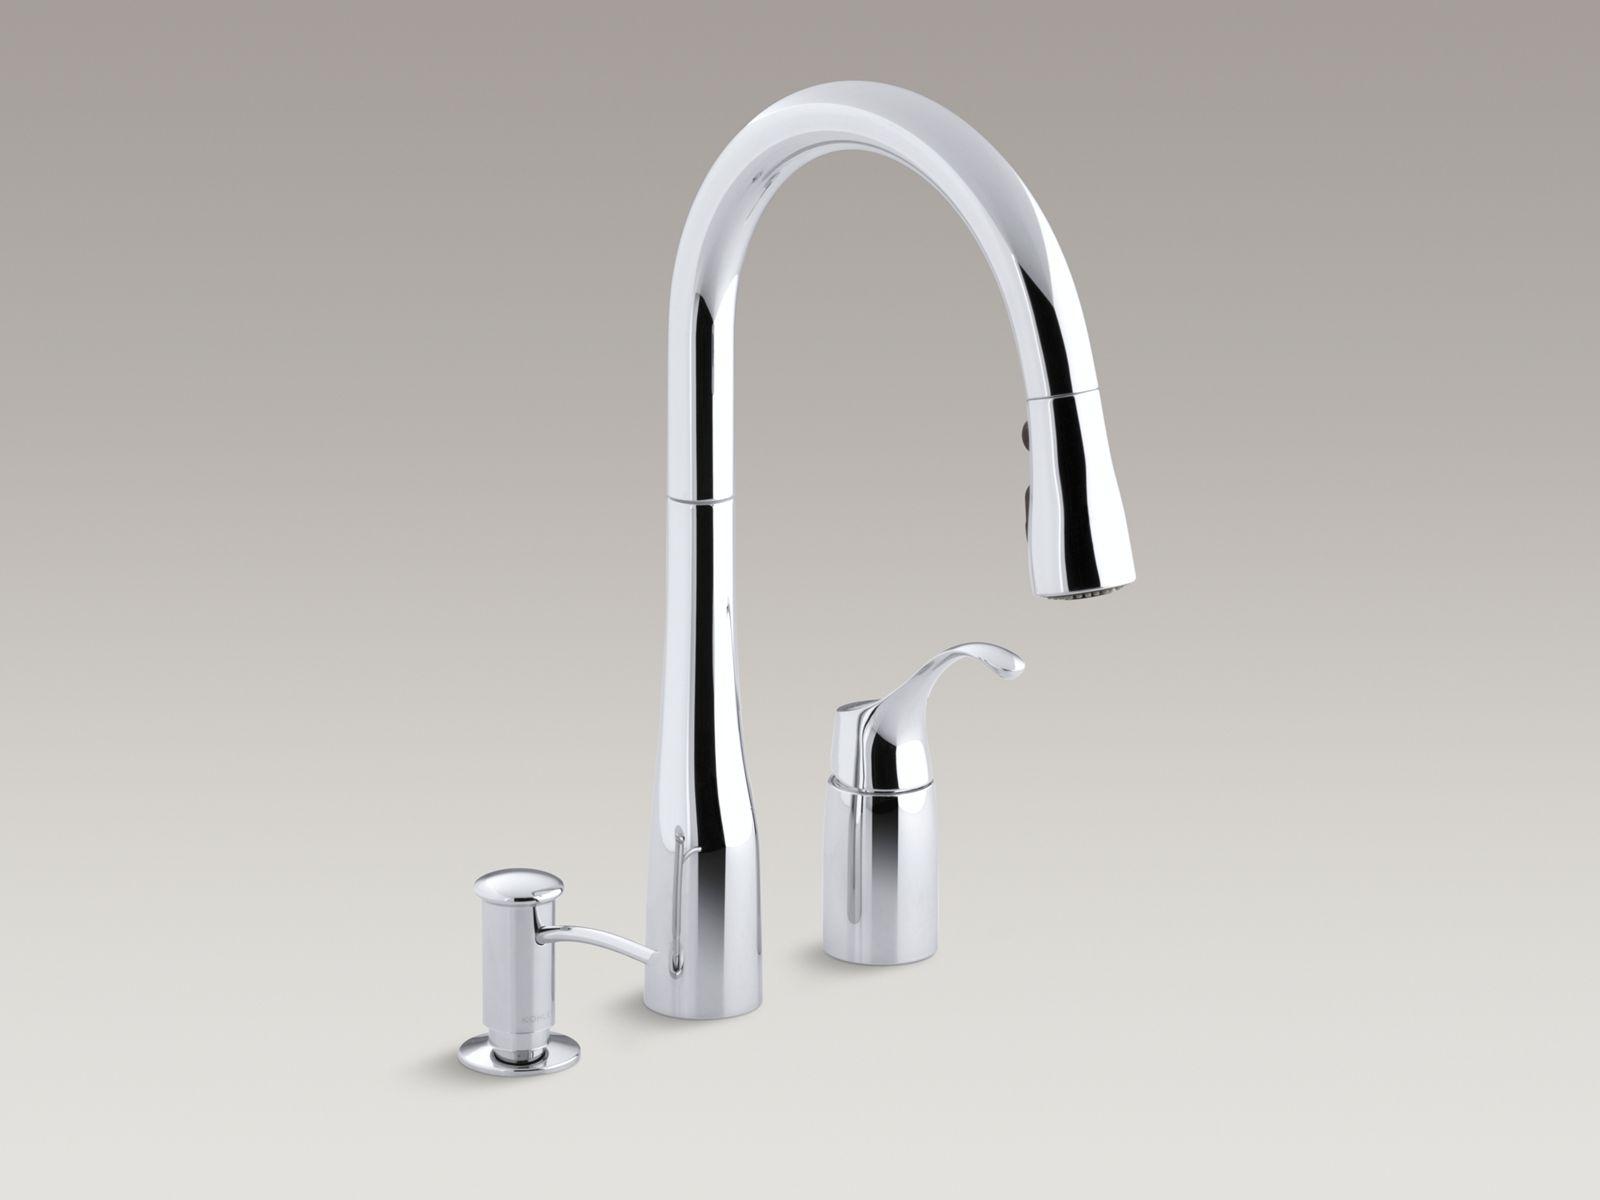 Image of: K R648 Simplice Pull Down Kitchen Sink Faucet W Soap Dispenser Kohler